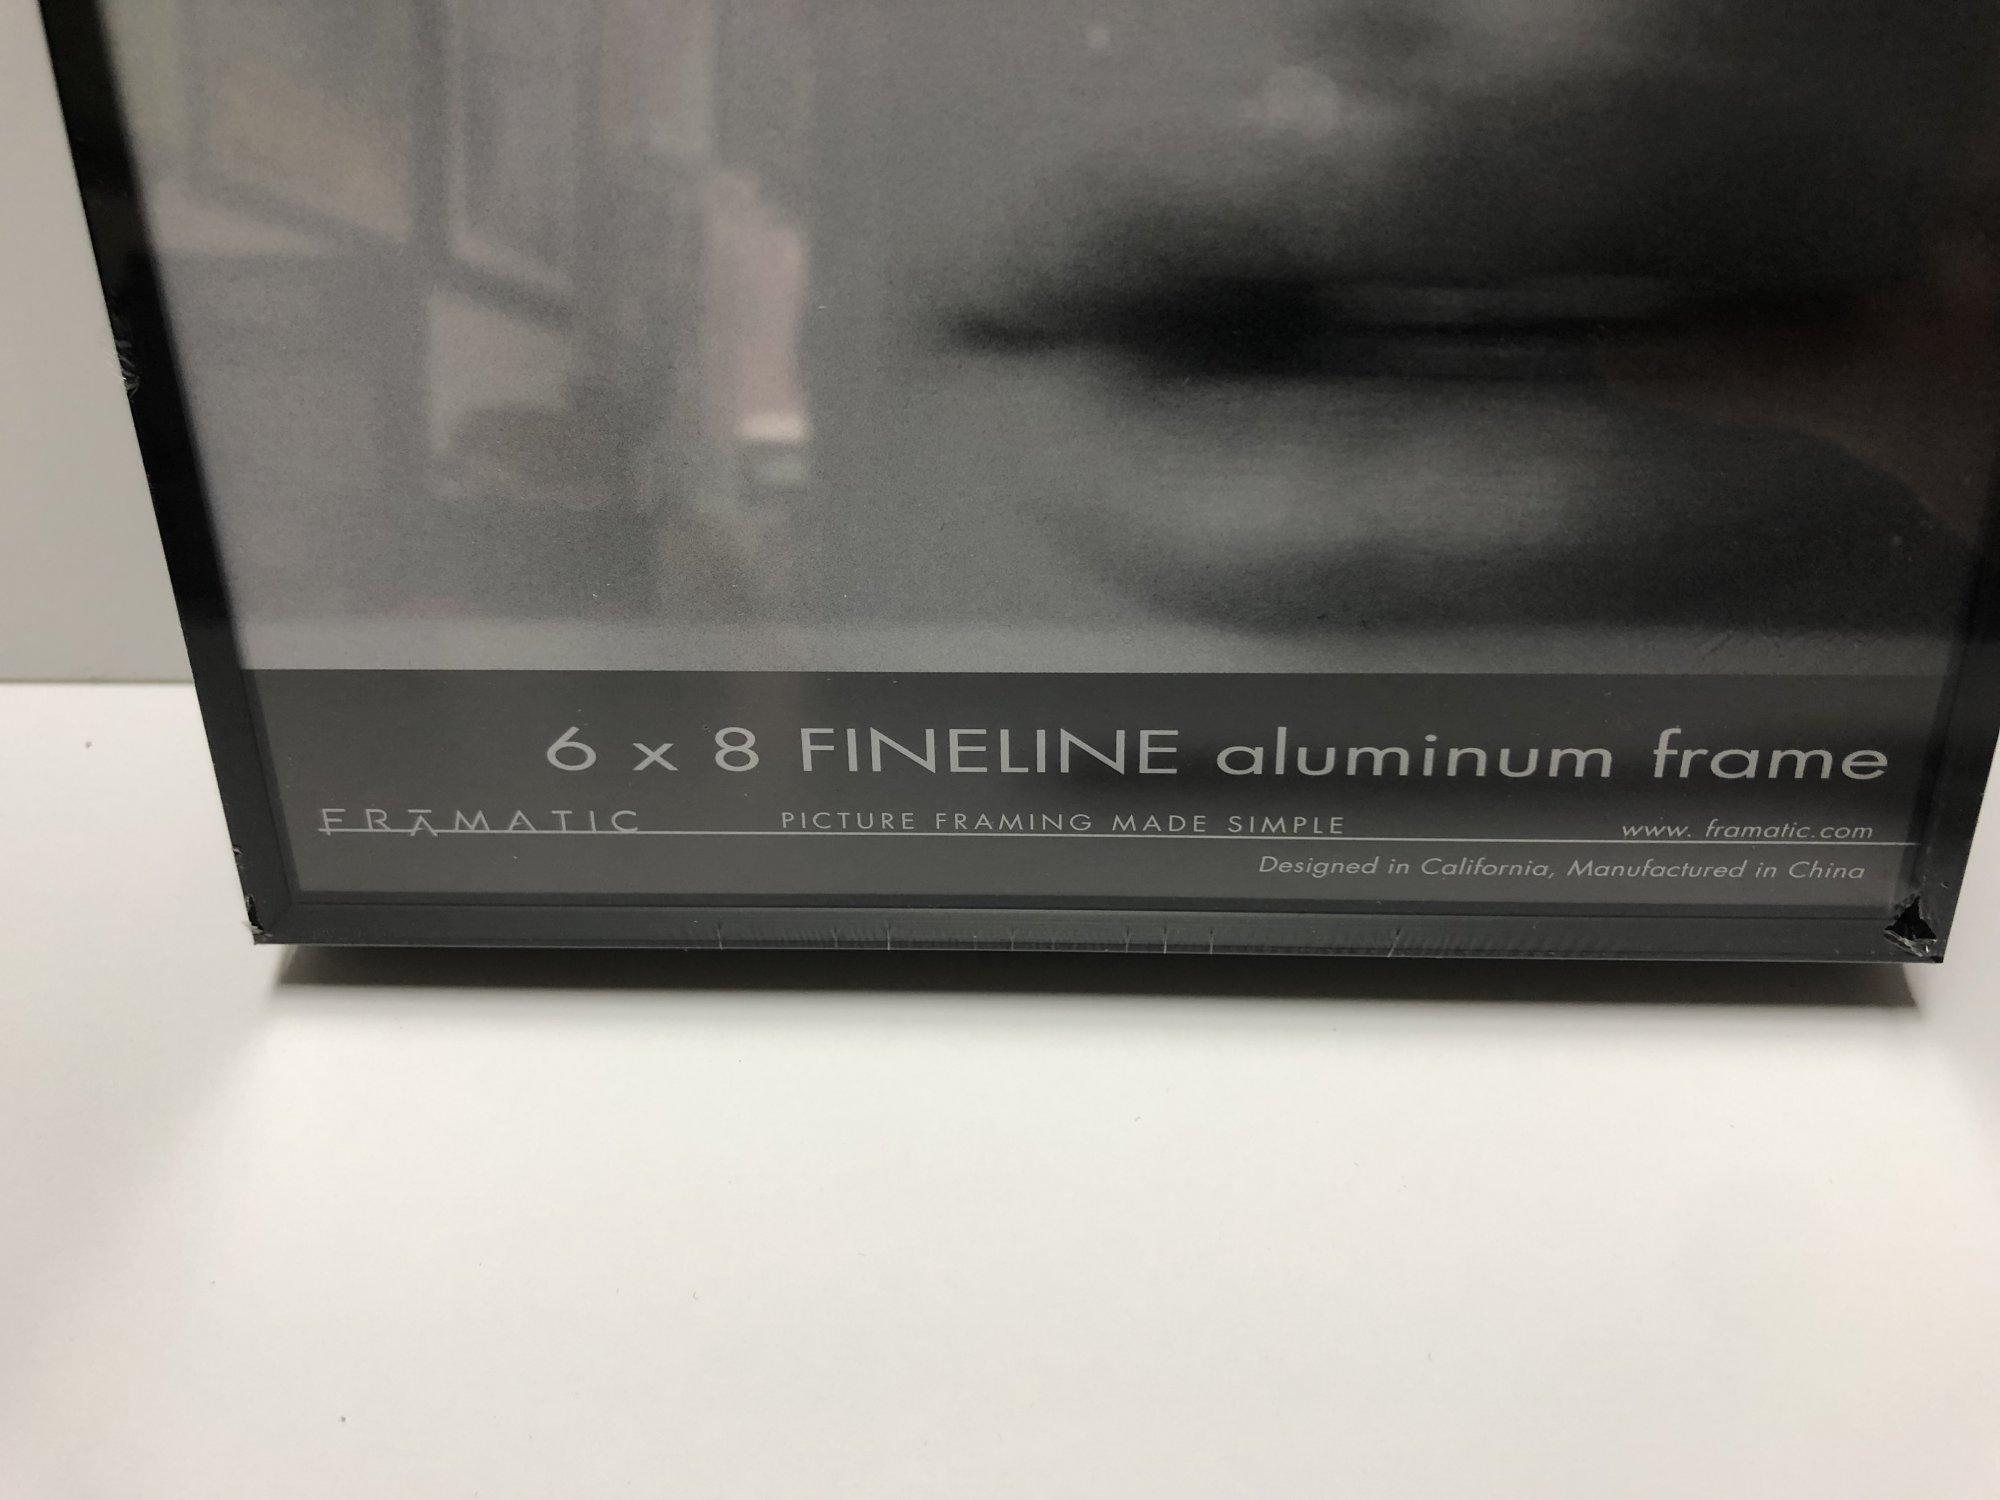 Framatic Fineline 6 x 8  Black Metal Readymade Frame